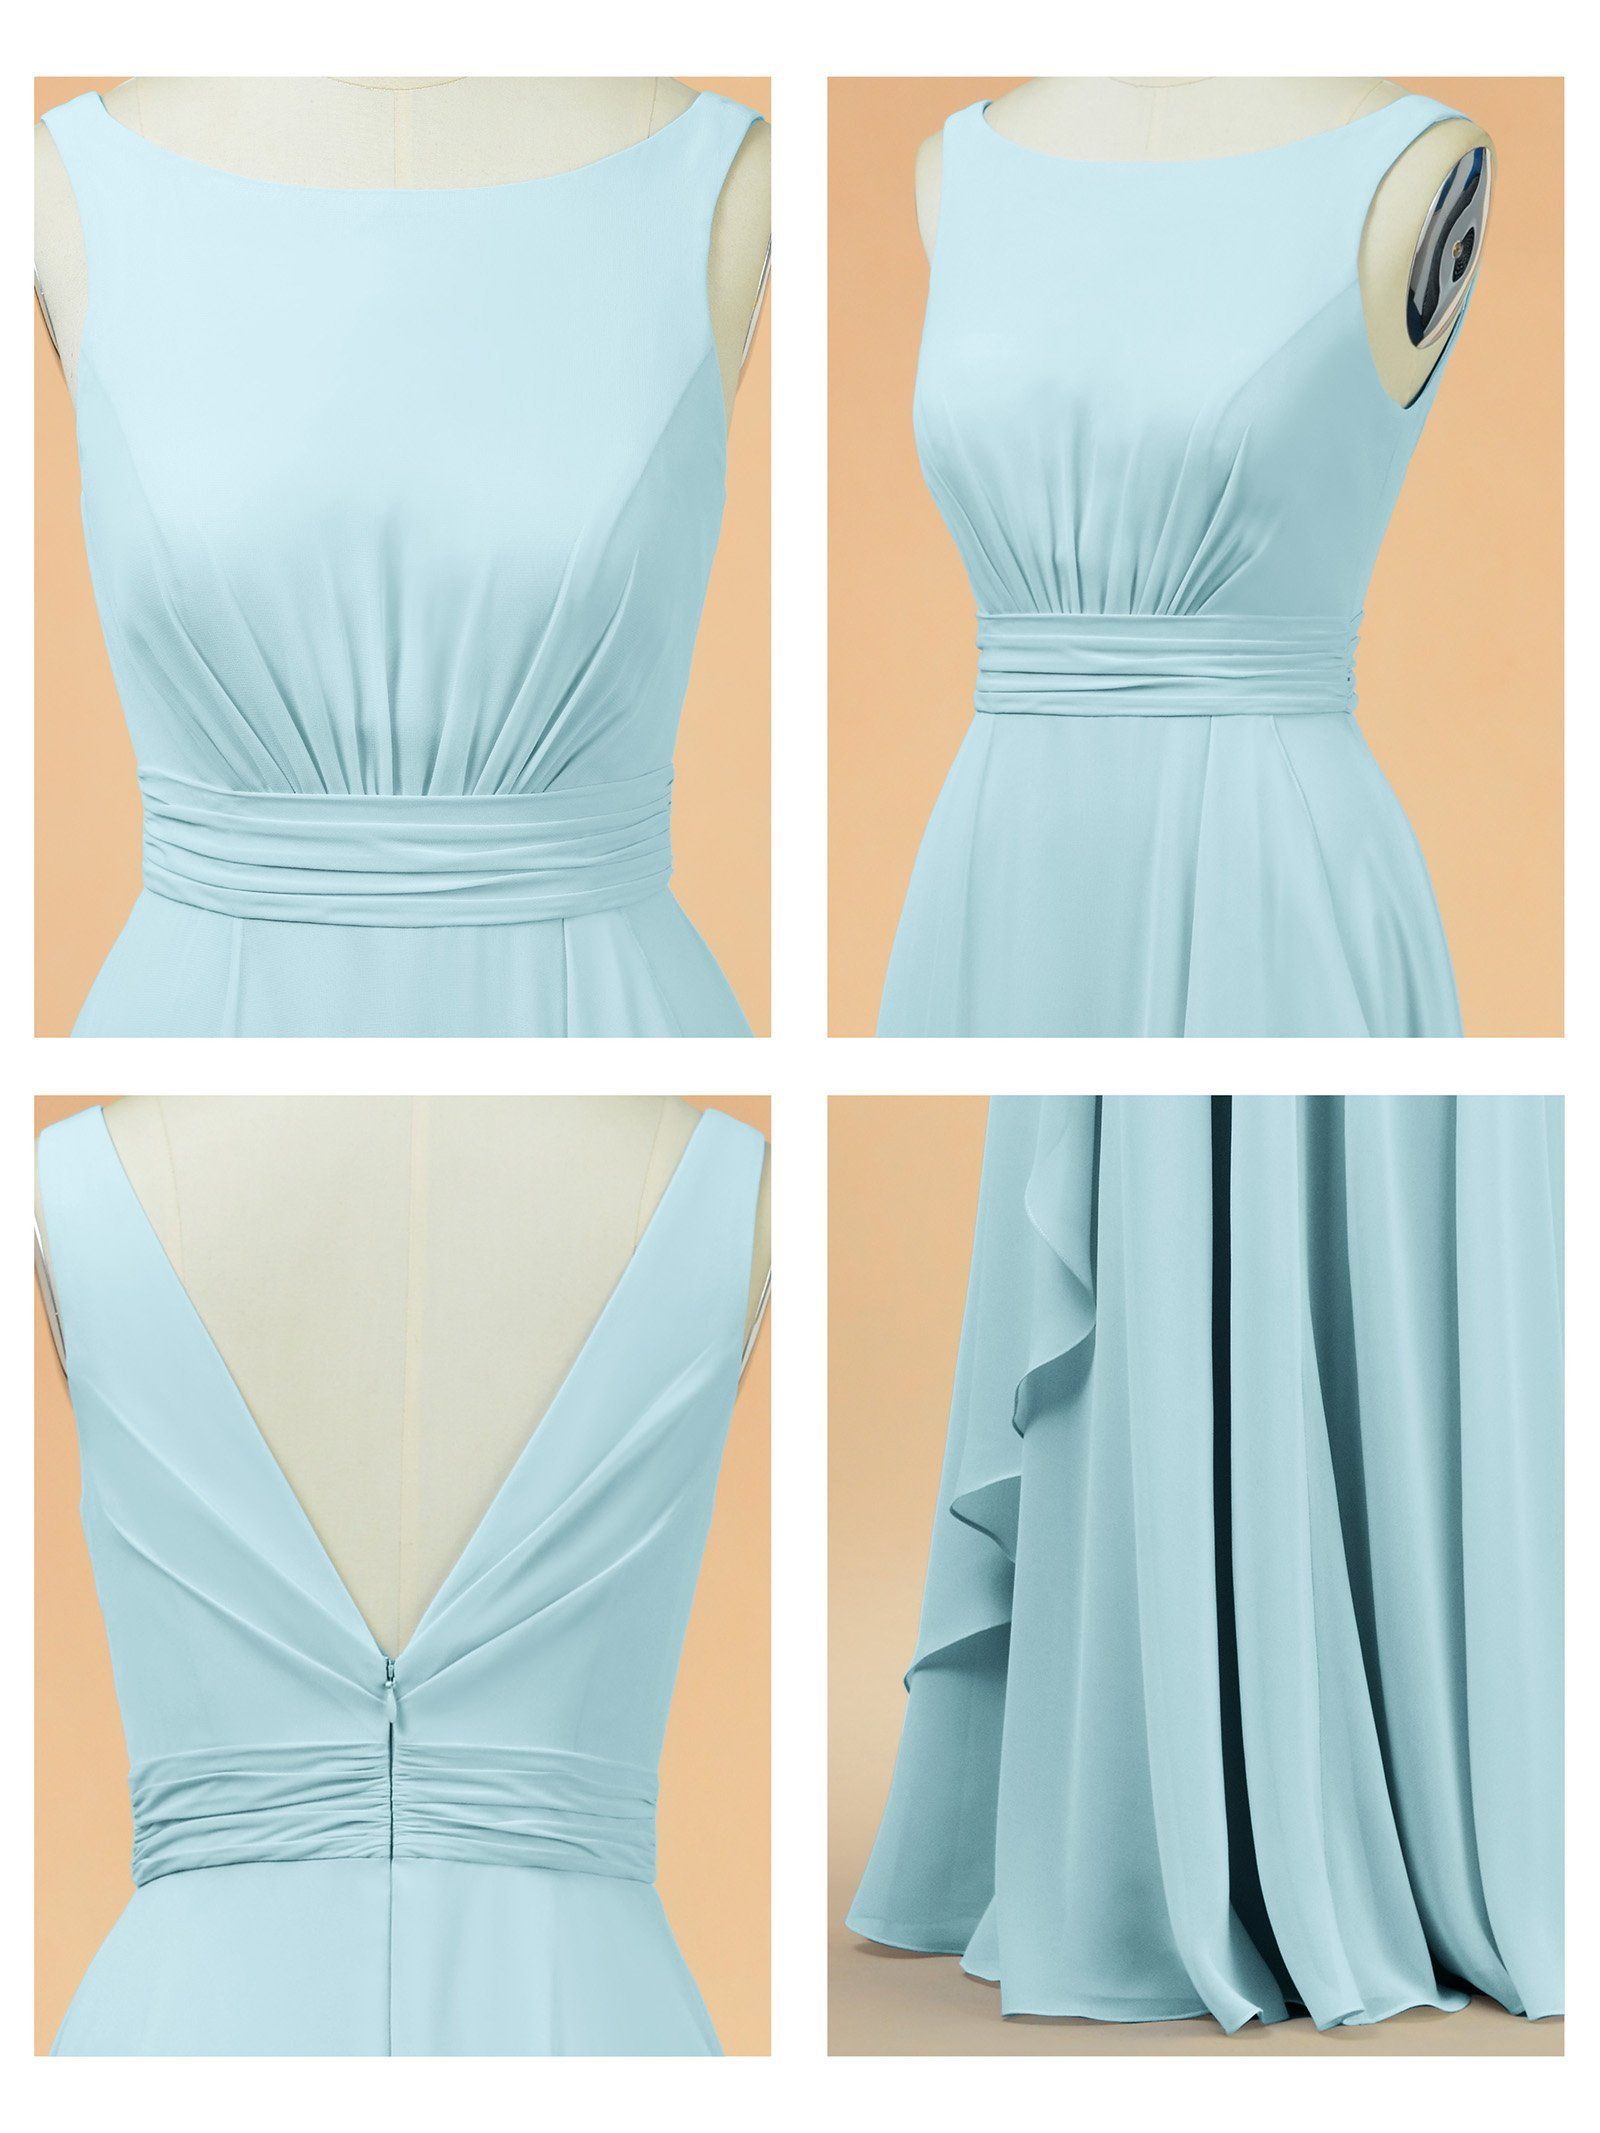 Alicepub aline chiffon bridesmaid dress long party evening dresses